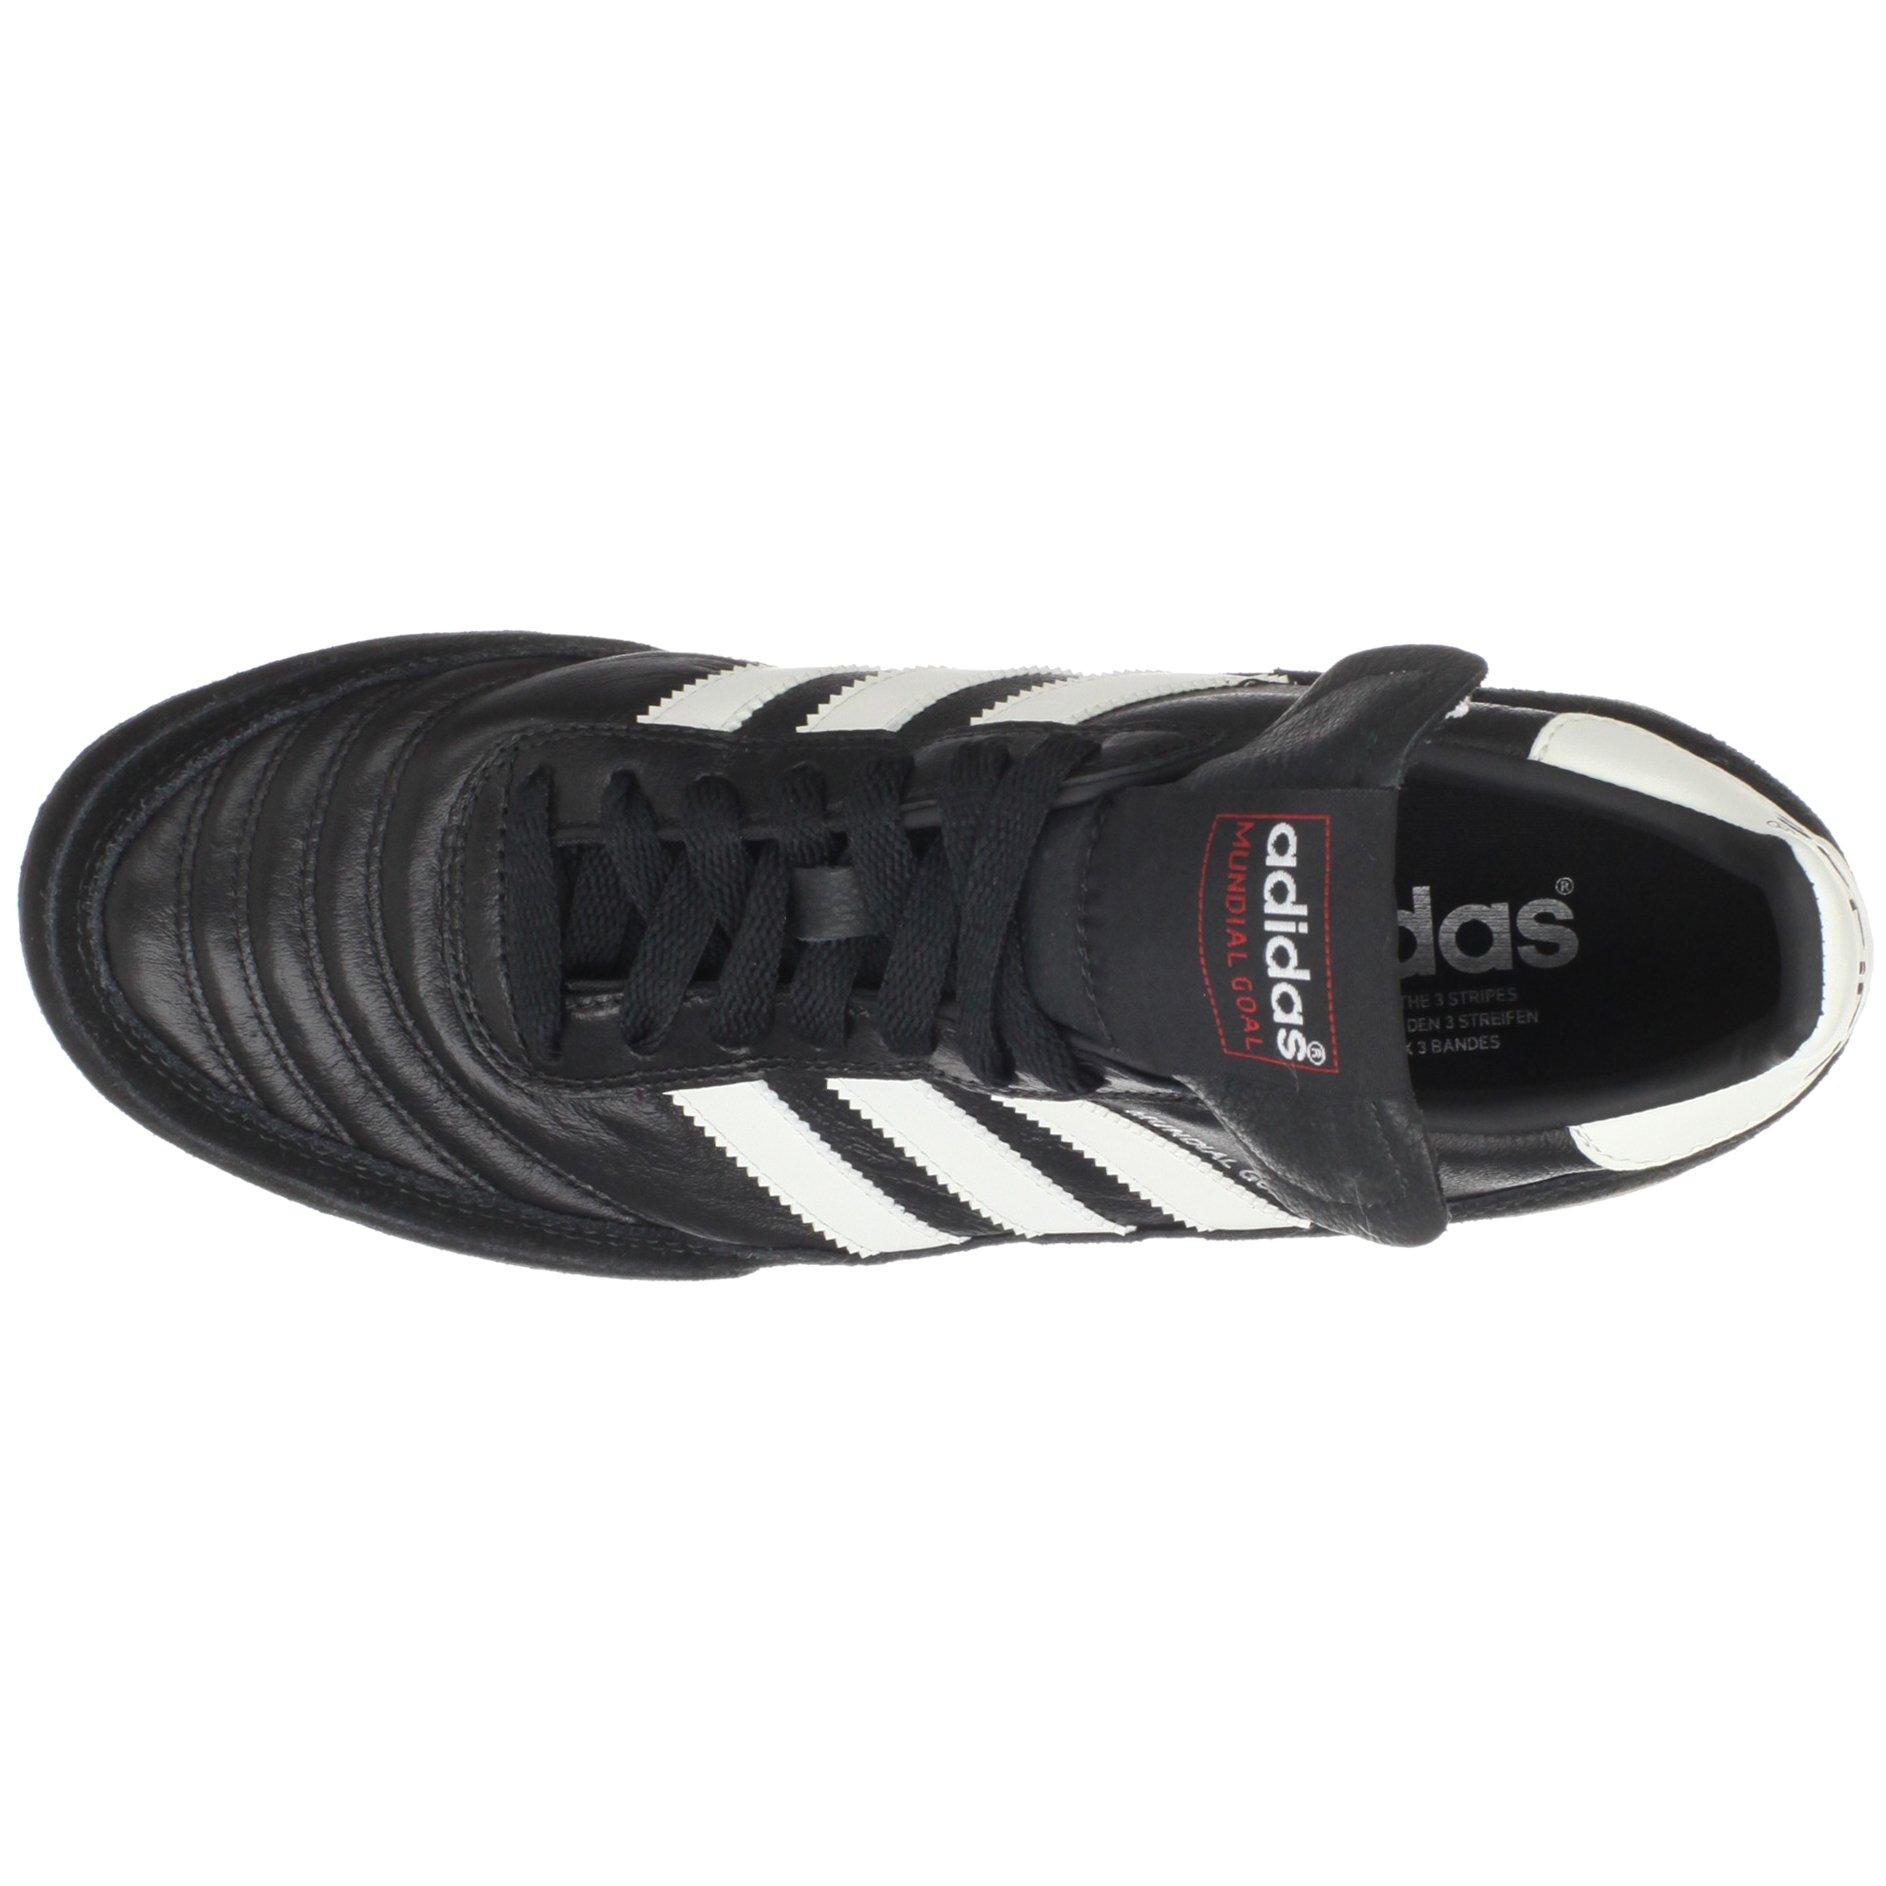 adidas Men's Mundial Goal Soccer Cleat, Black/White/White, 5 M US by adidas (Image #7)